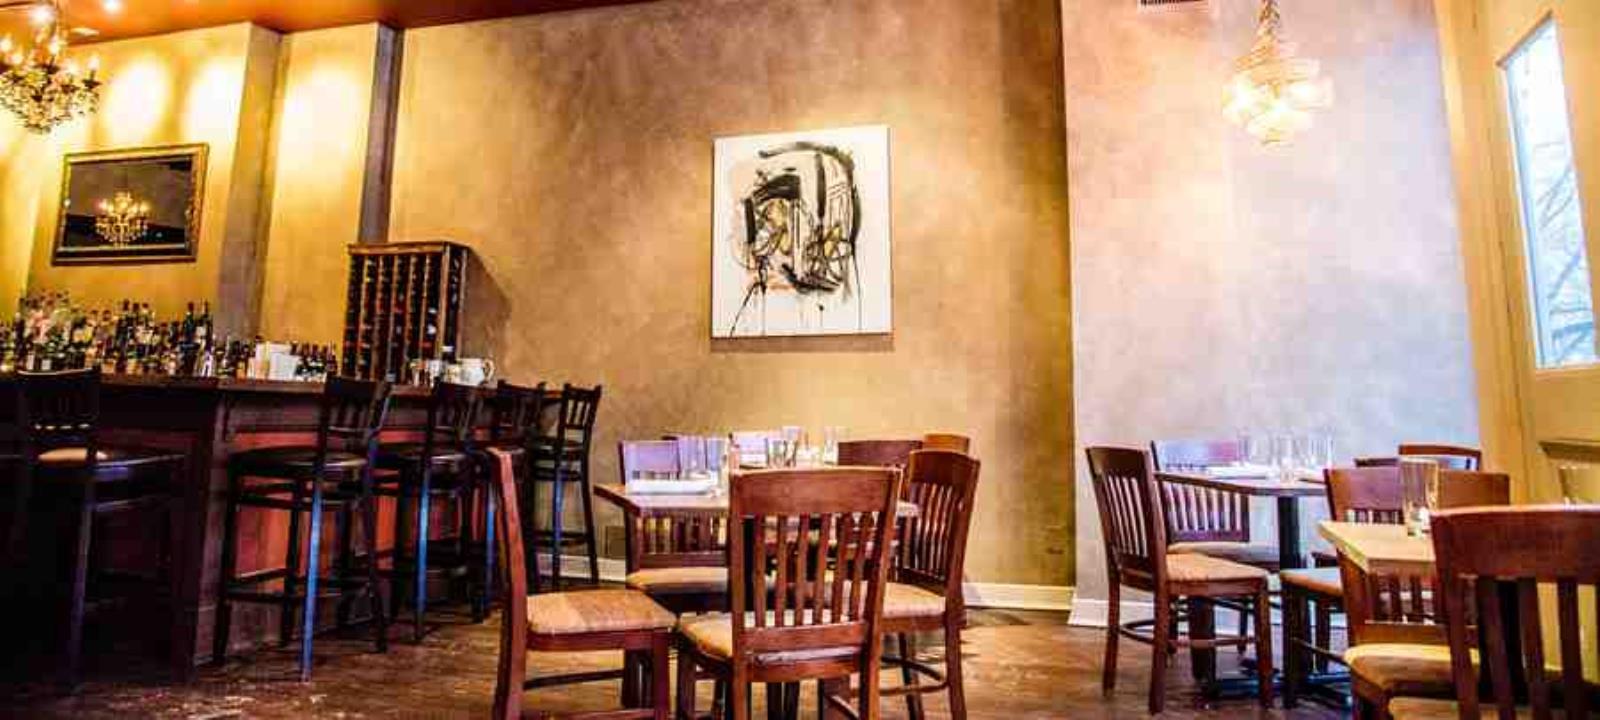 Merchant Street Restaurant - Picture